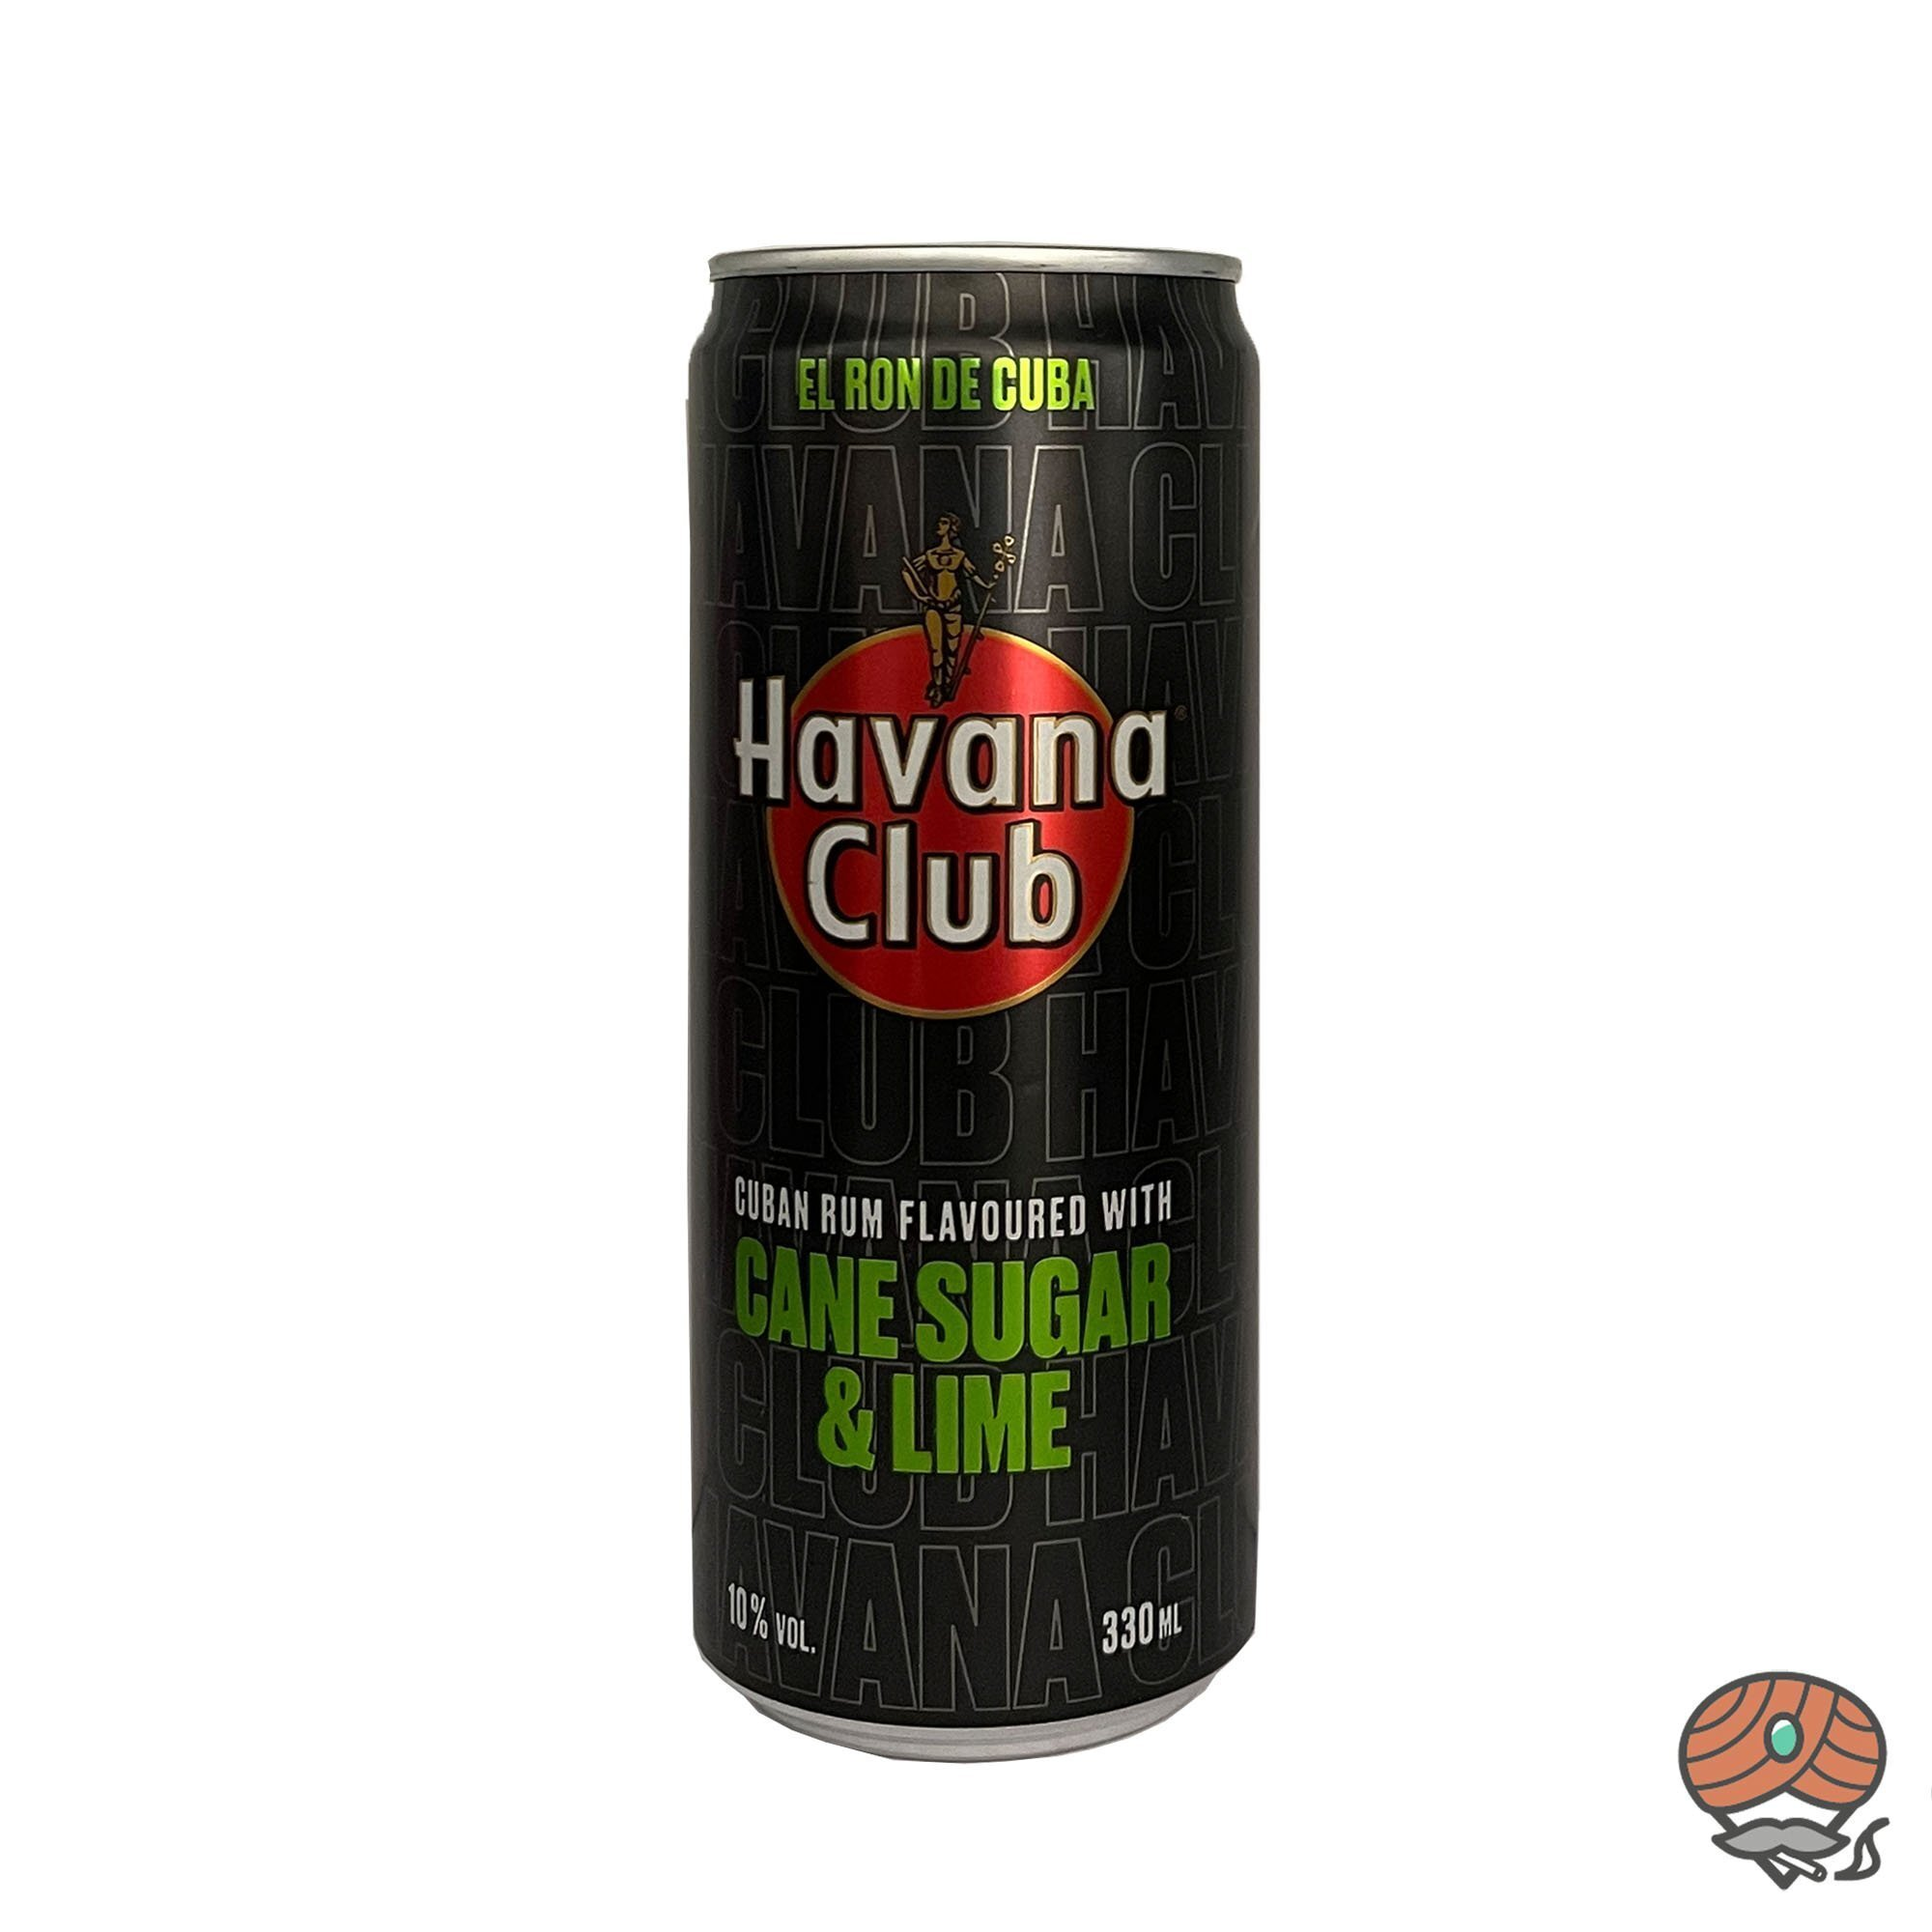 Havana Club Rum - Cane Sugar&Lime inkl.0,25 Euro Pfand alc. 10% Vol